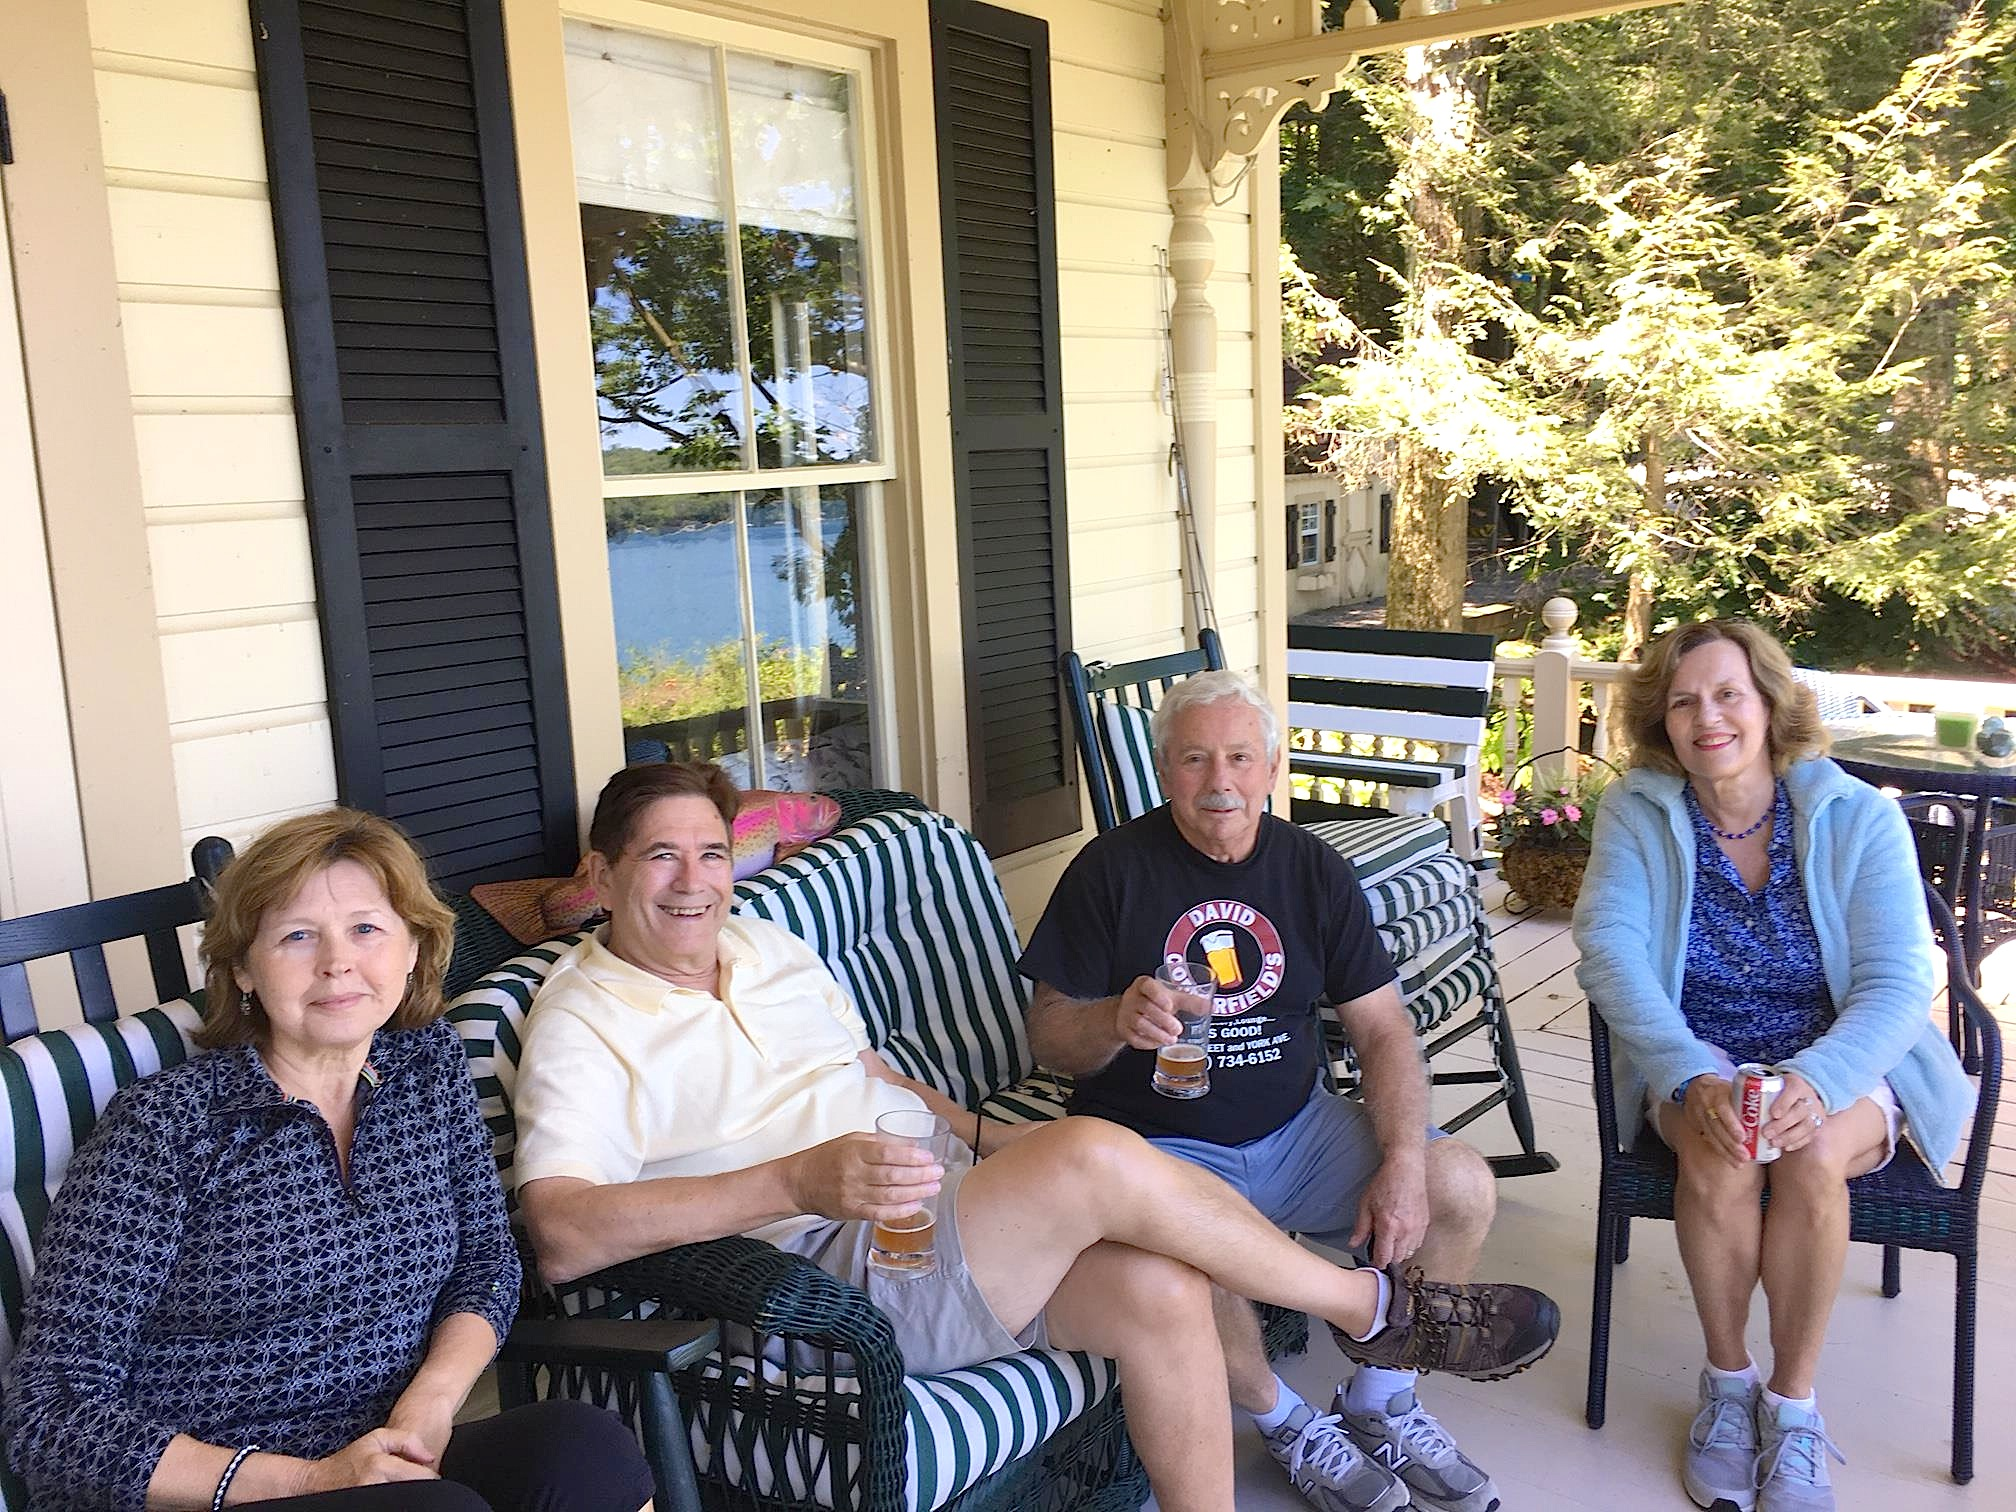 Barbara, John, Don & Lorraine  7-7-18 Skaneateles